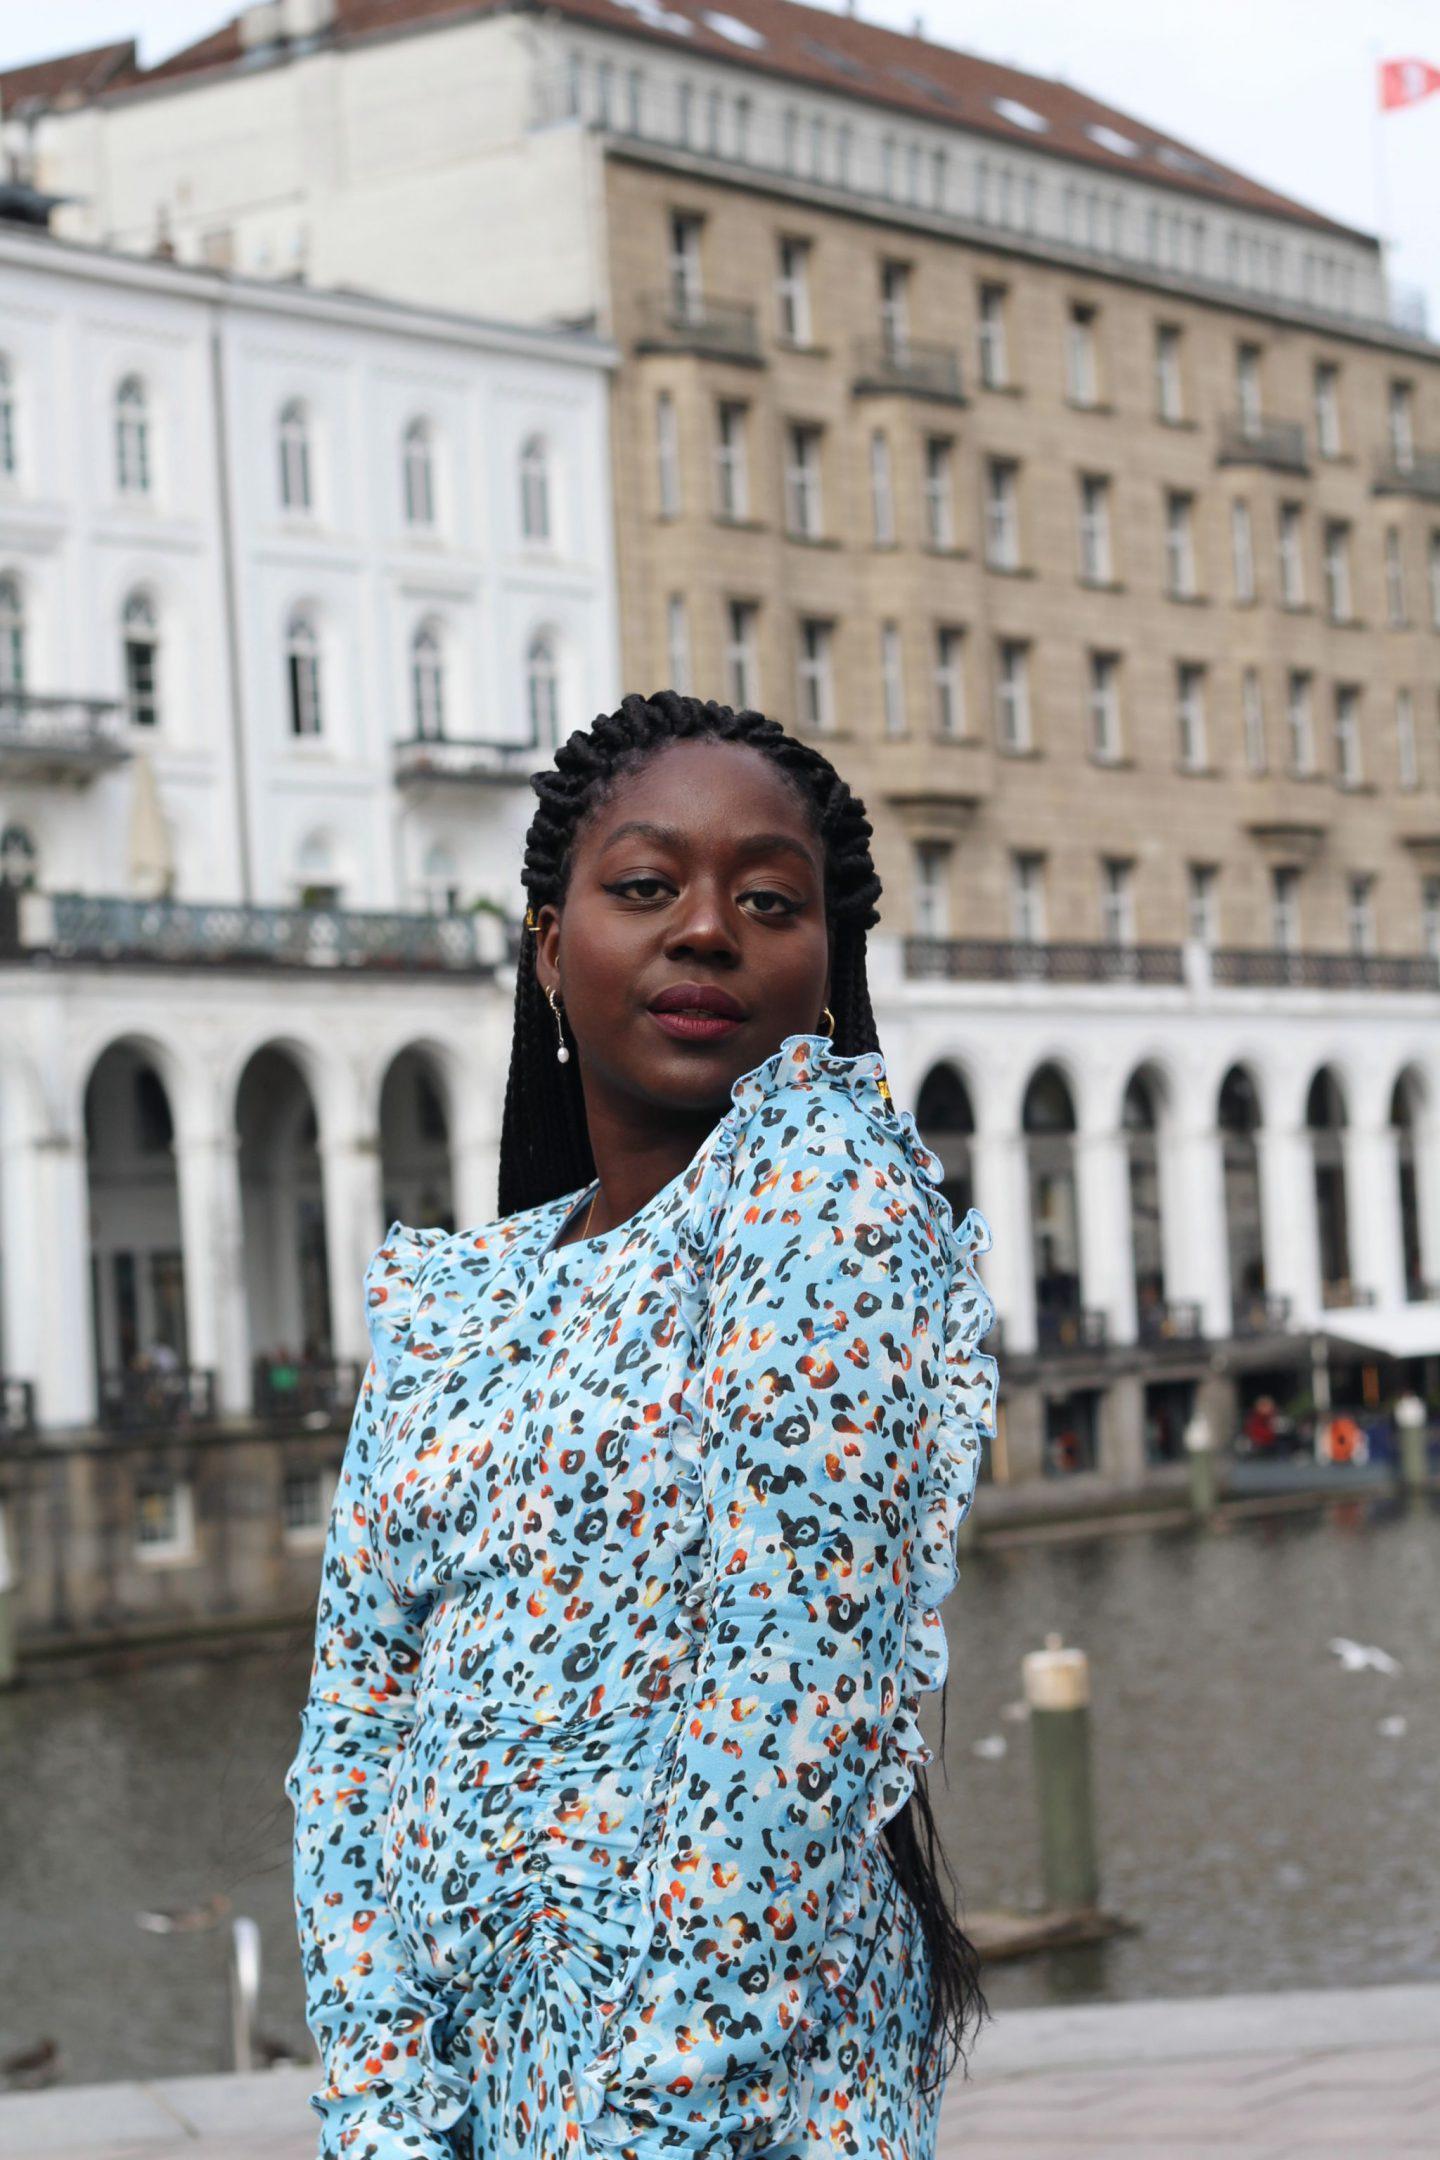 Lala_Berlin_Streetstyle_Lois_Opoku_Fashion_Blogger_1